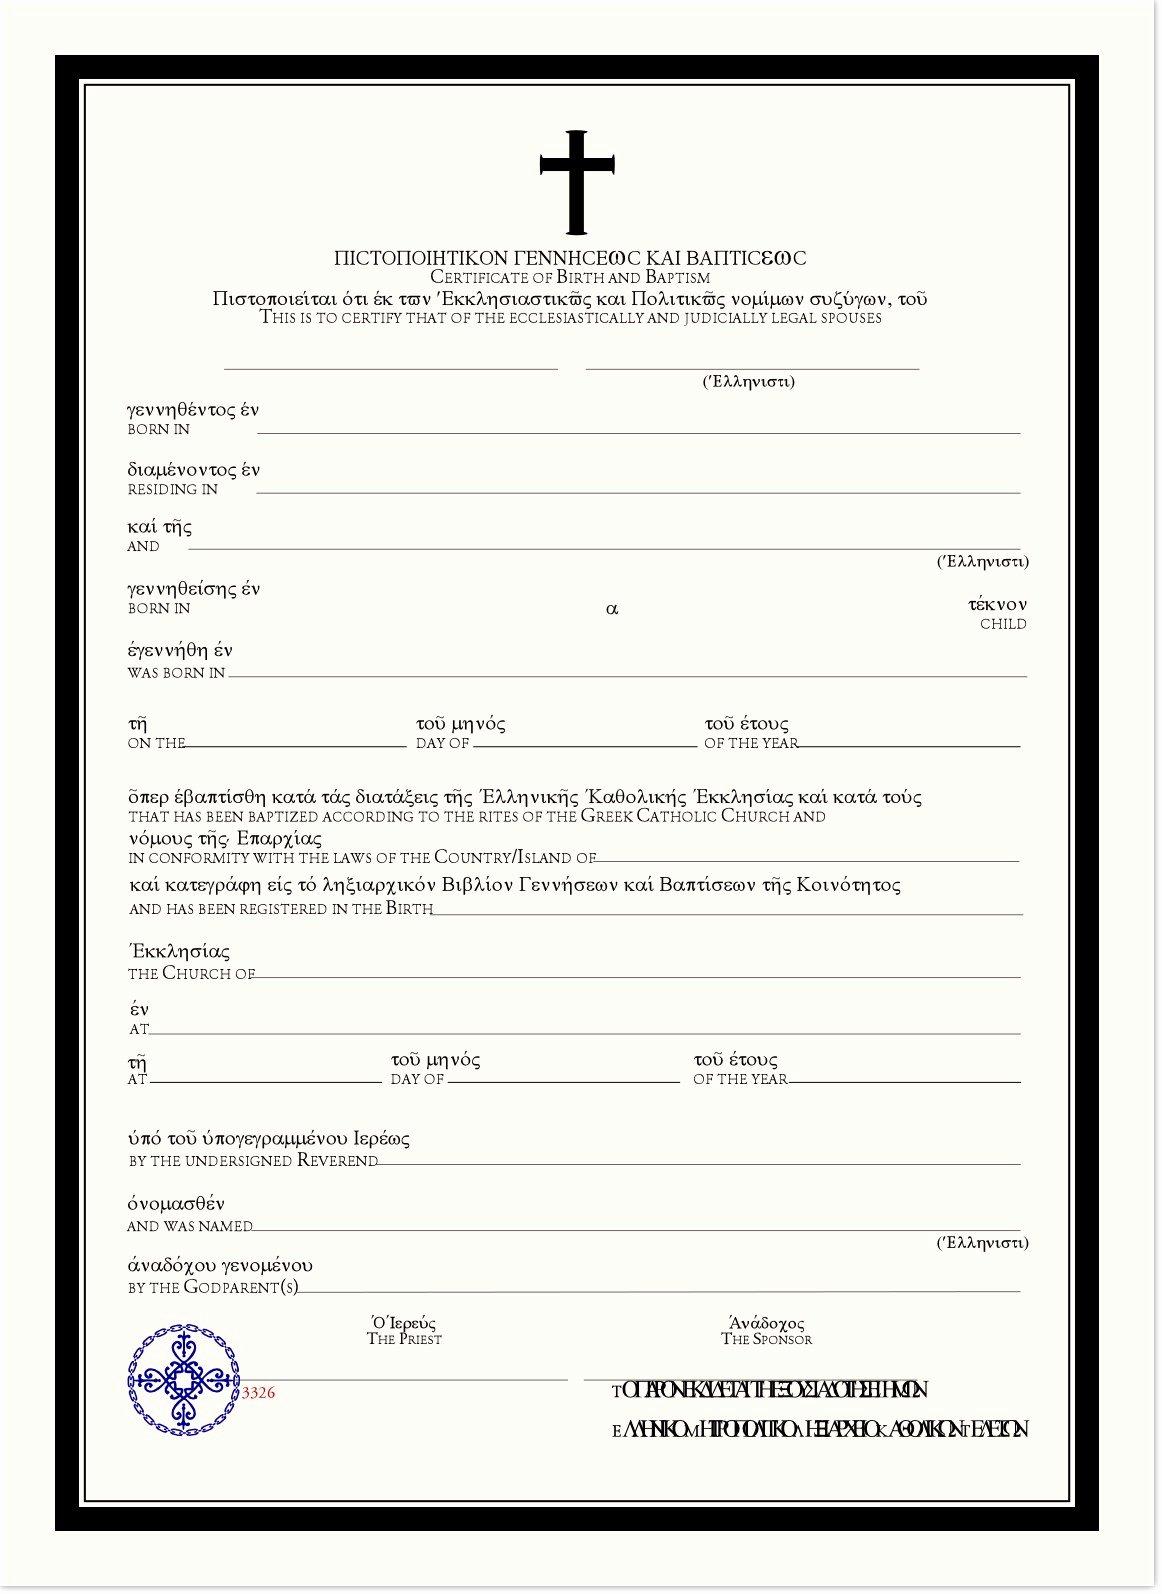 Catholic Baptism Certificate Template New Greek Catholic Baptism Certificate